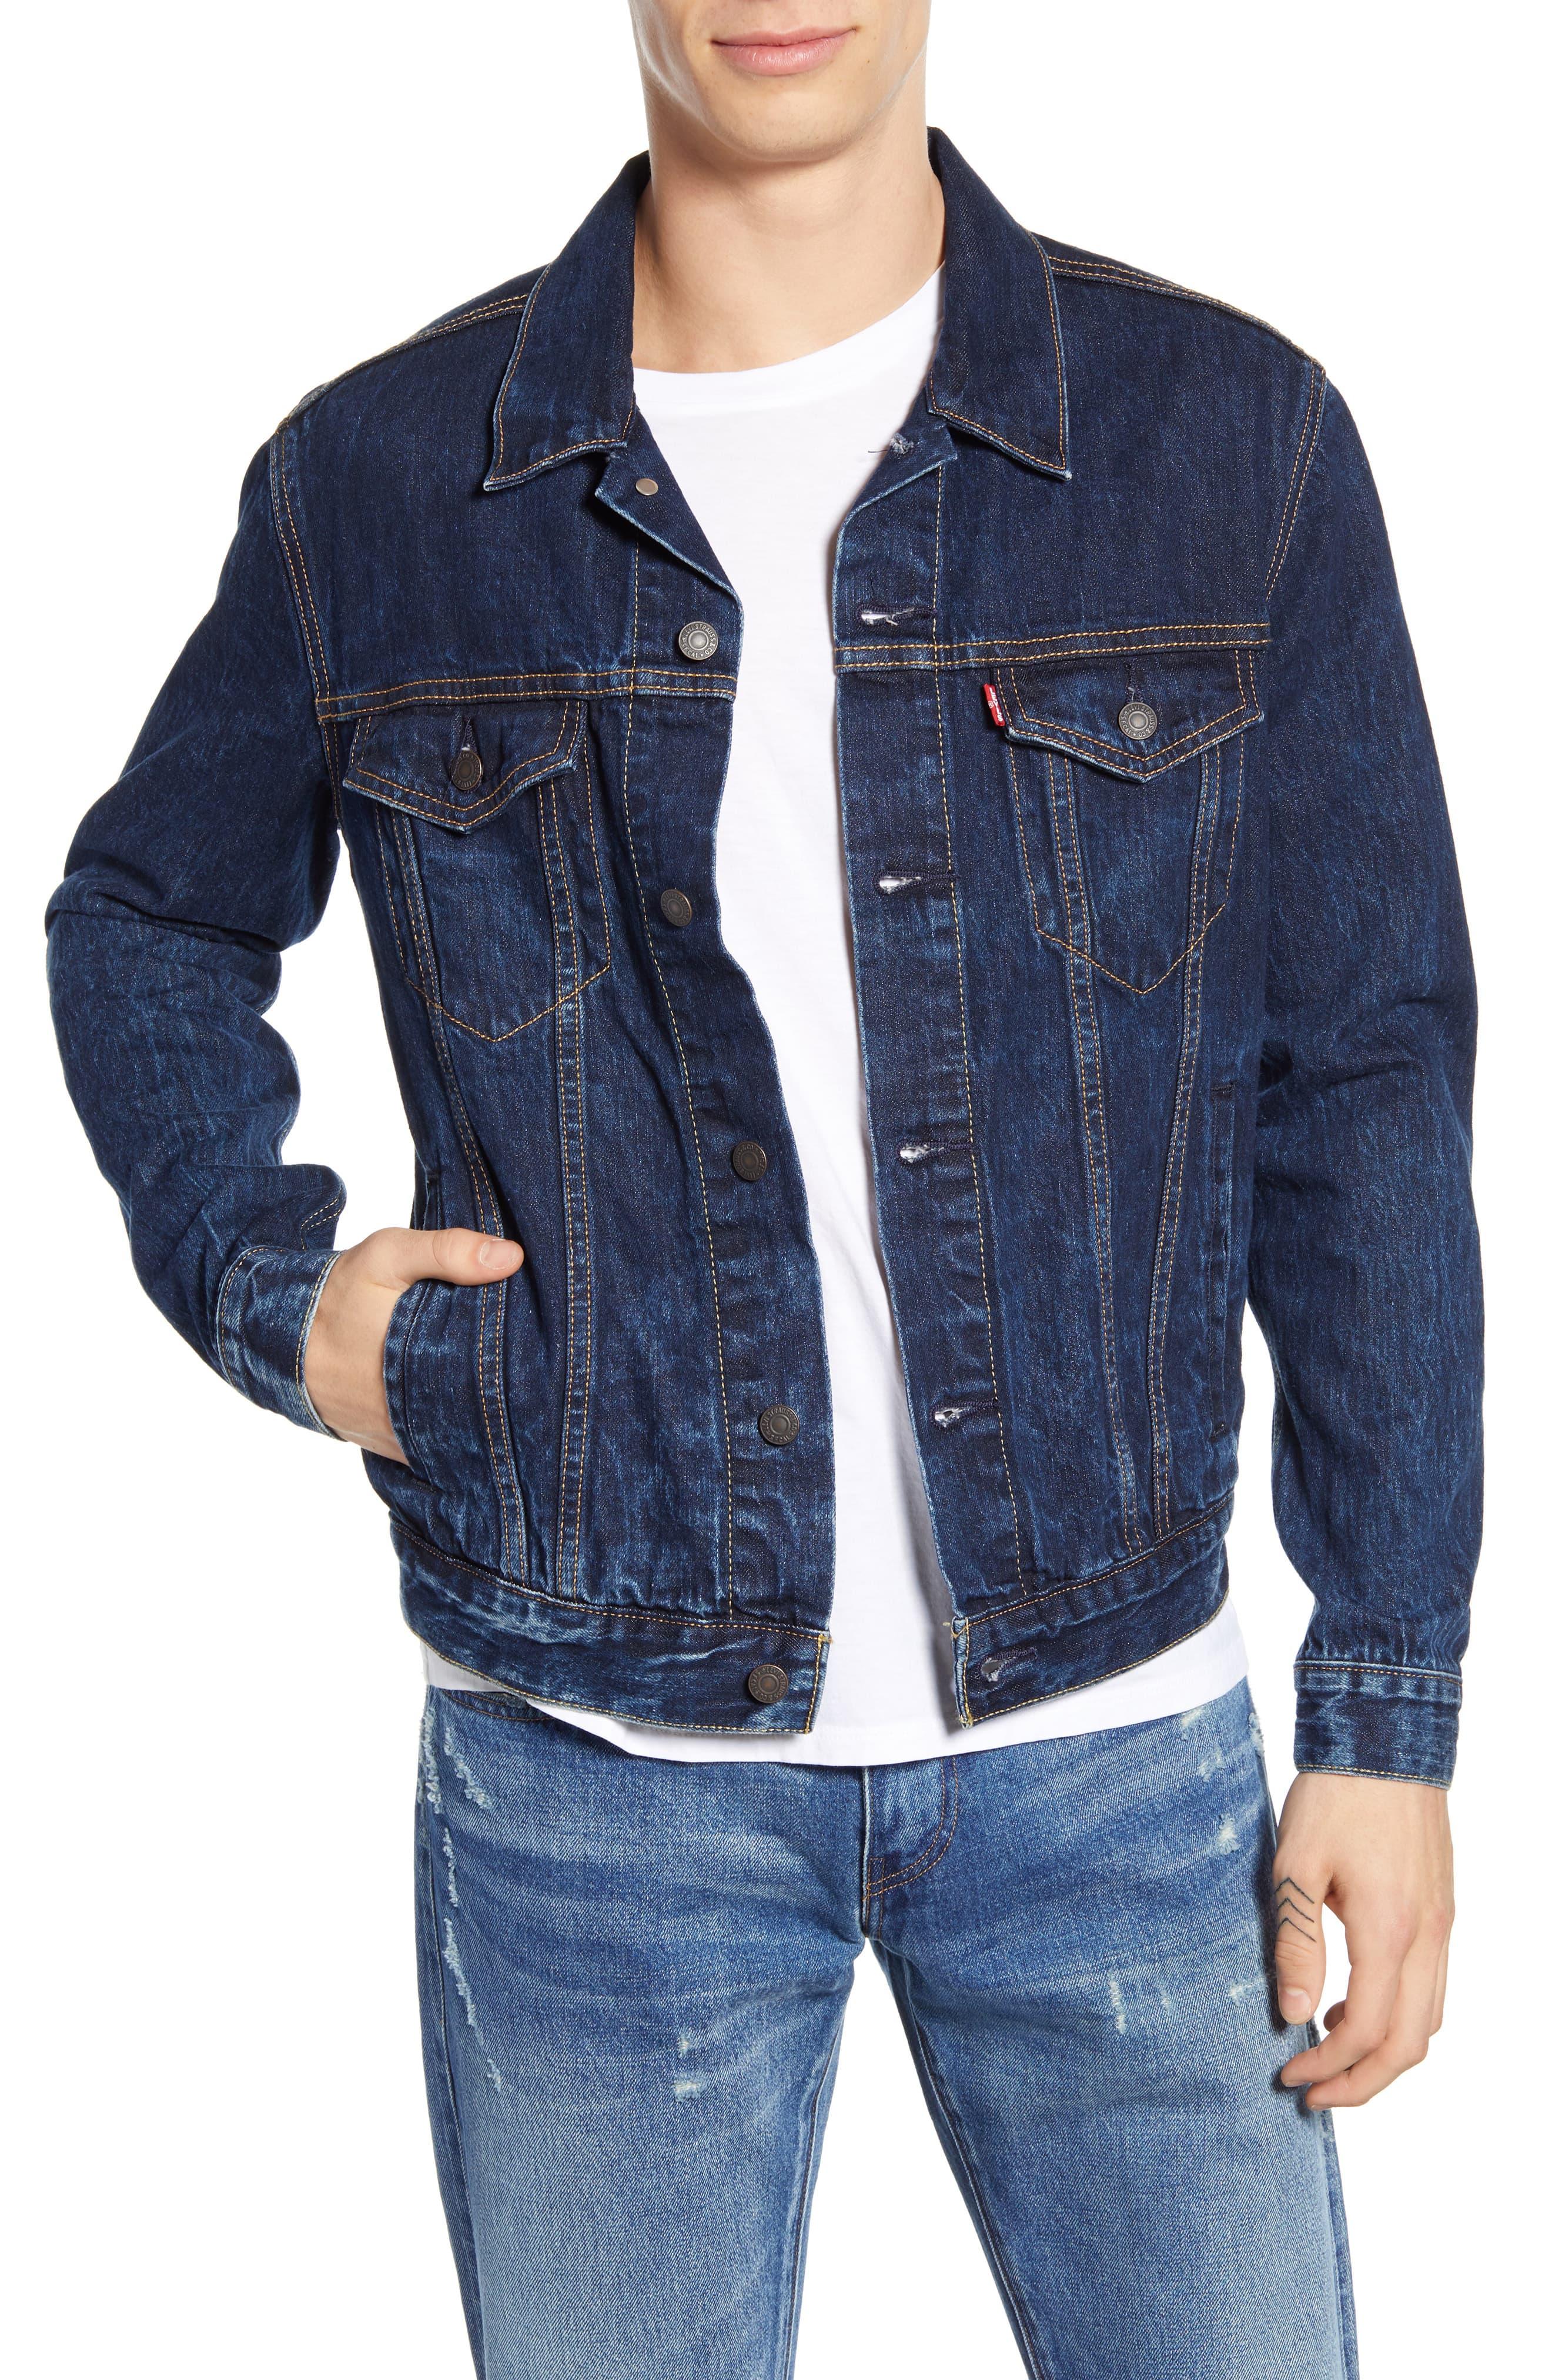 Levi S Denim Trucker Jacket Nordstrom Jackets Men Fashion Denim Outfit Men Denim Jacket Outfit [ 4048 x 2640 Pixel ]